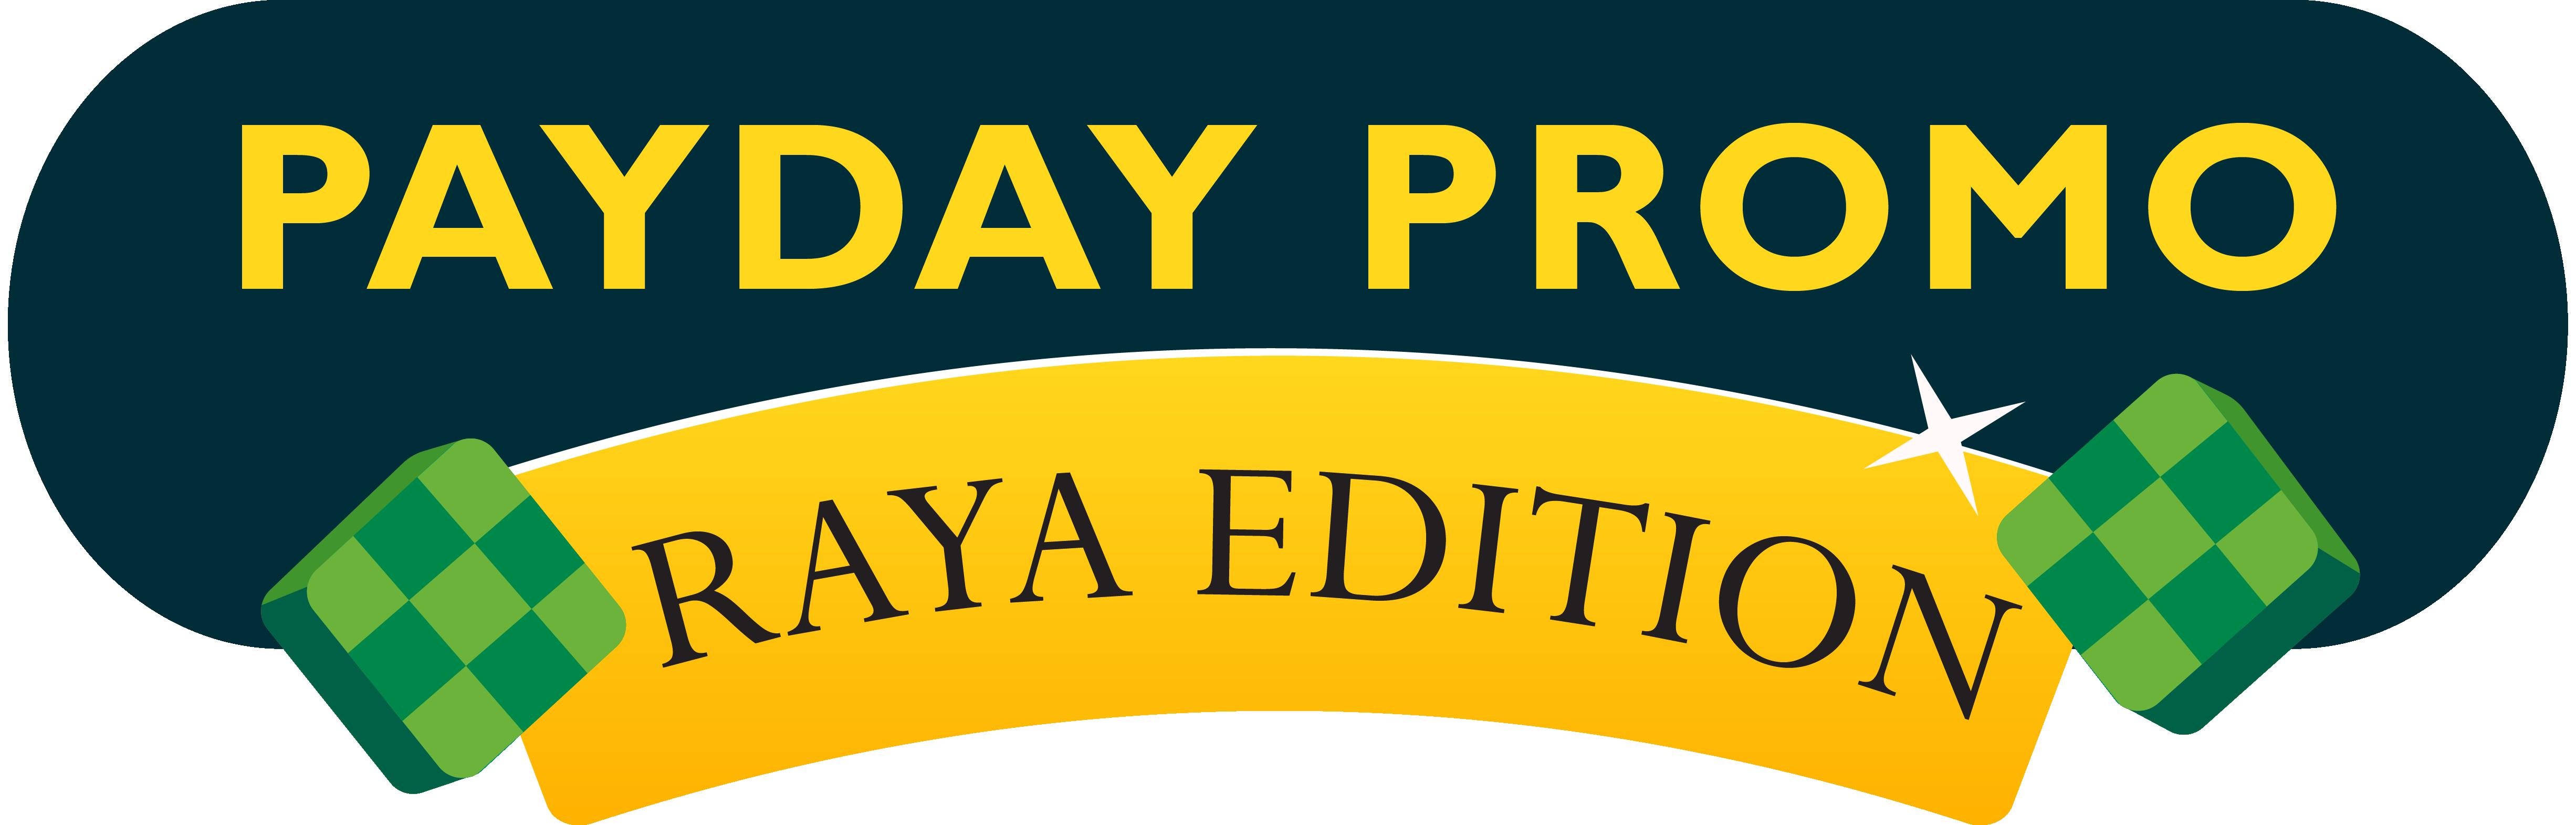 Weelago Payday Promo Raya Edition